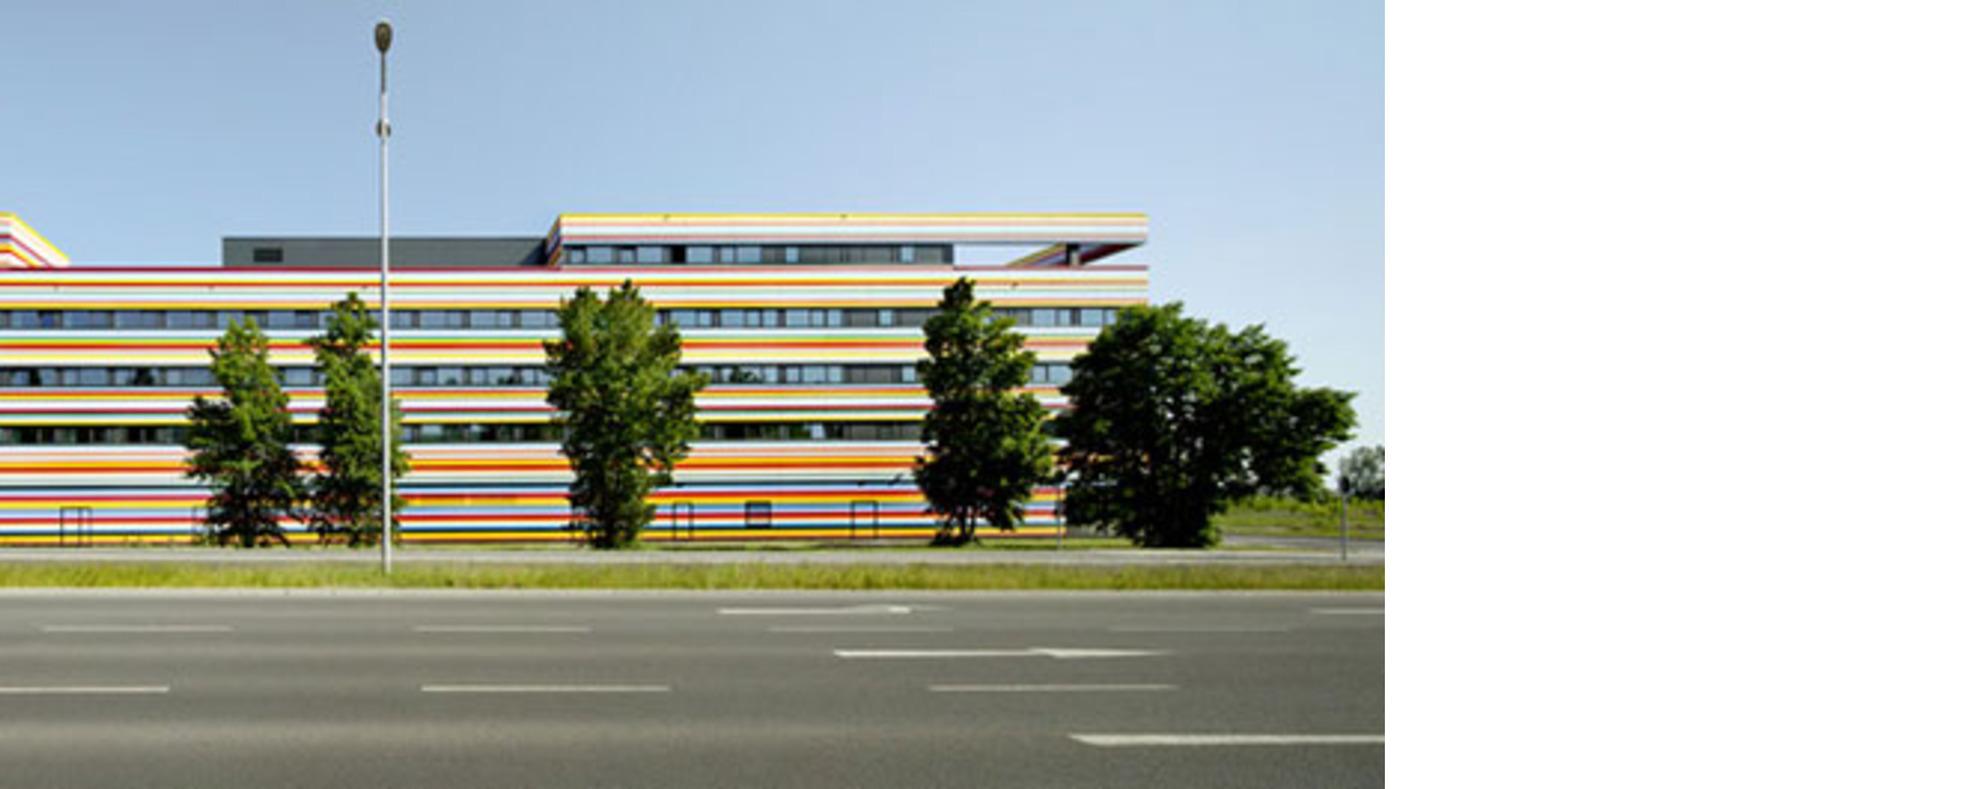 Petersen Architekten Berlin Airport Hotel Floornature